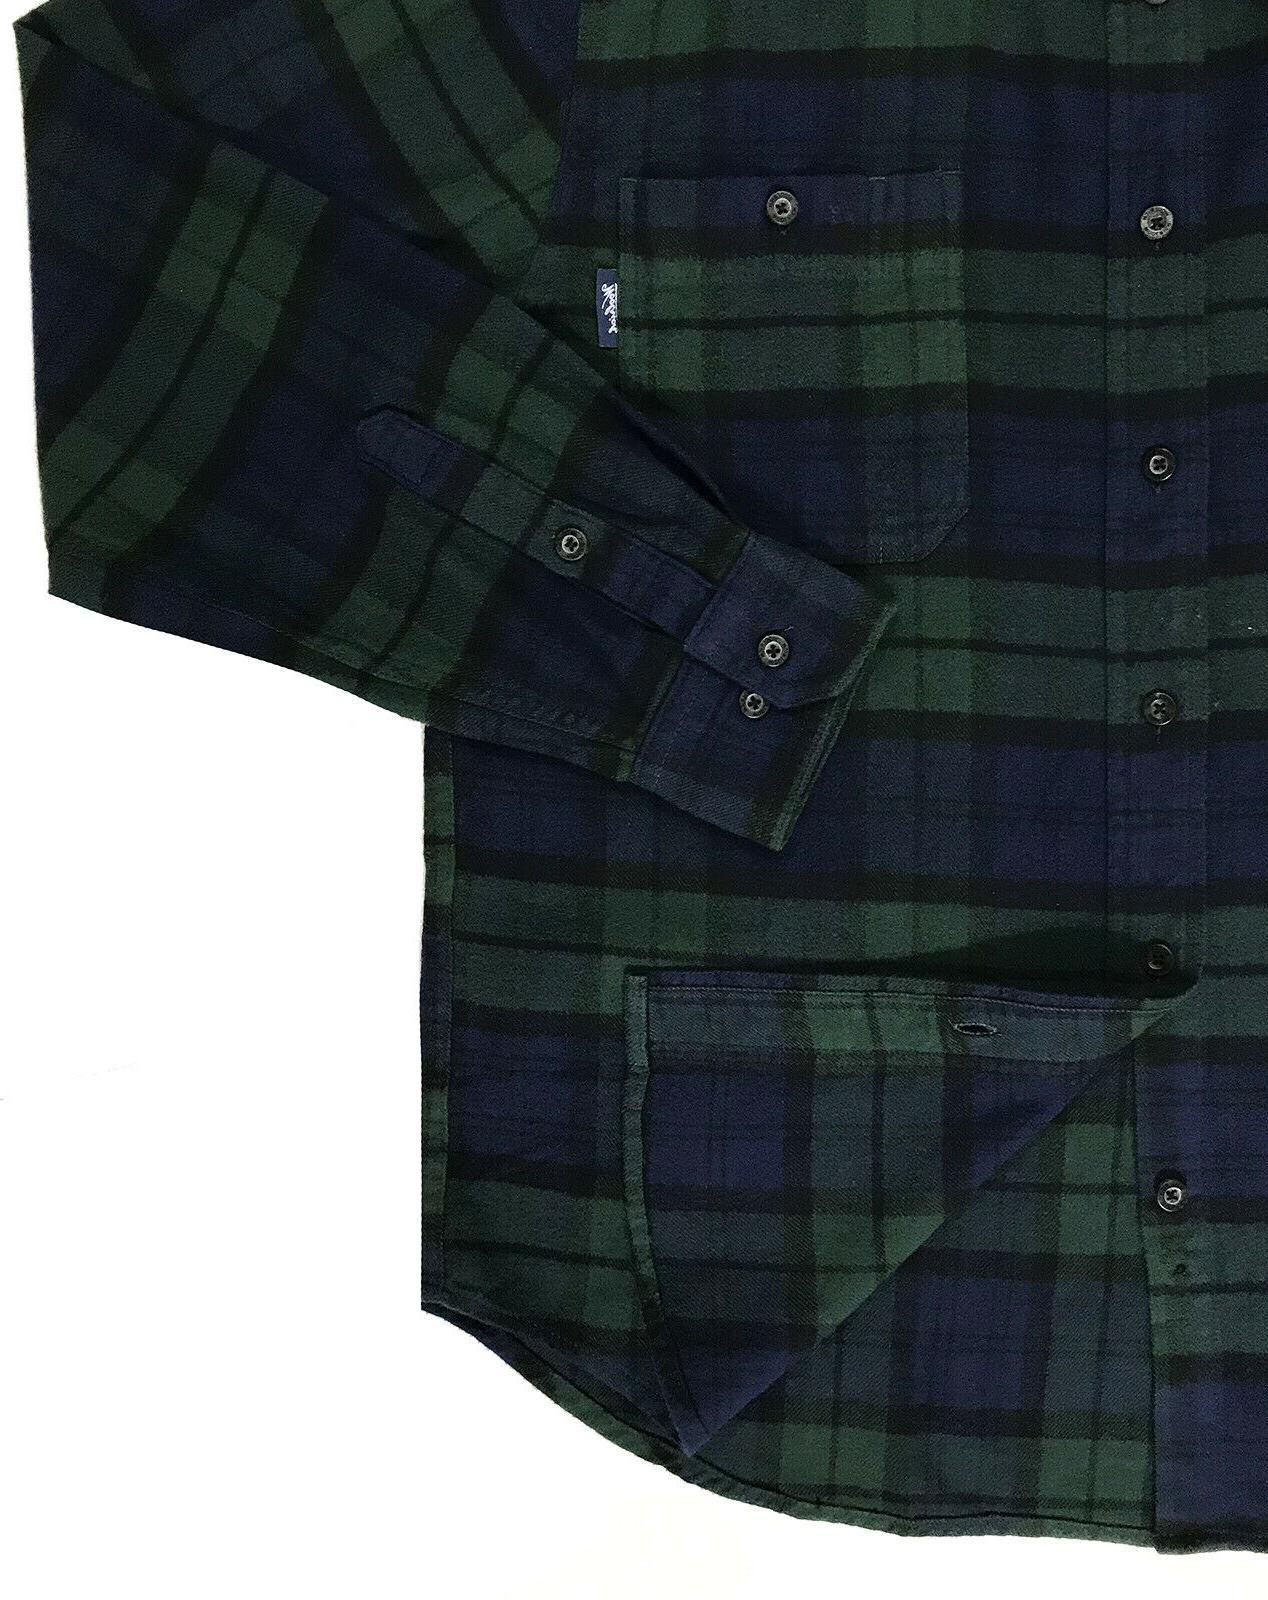 Men's WOOLRICH Green Black Plaid Shirt XL XLarge NEW